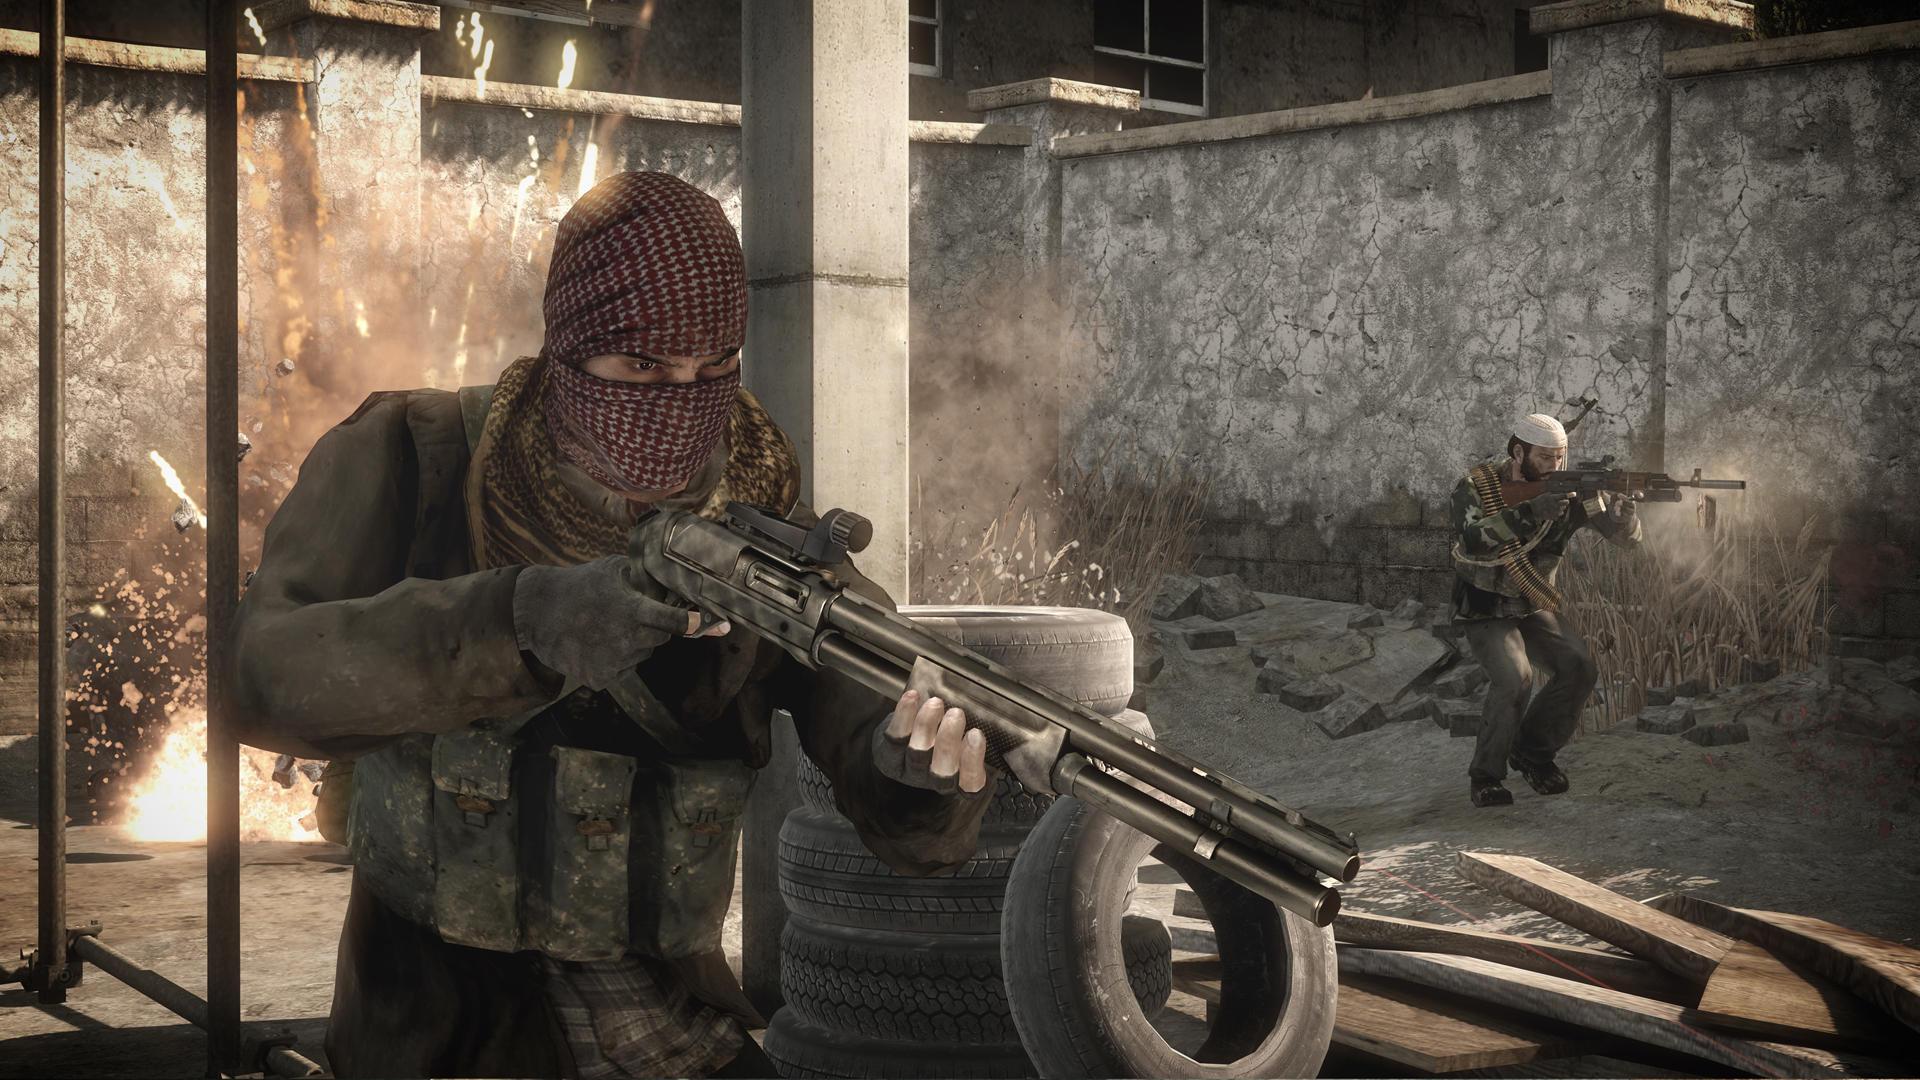 Dojmy z GamesComu - Medal of Honor, Crysis 2 a Dead Space 2 7622